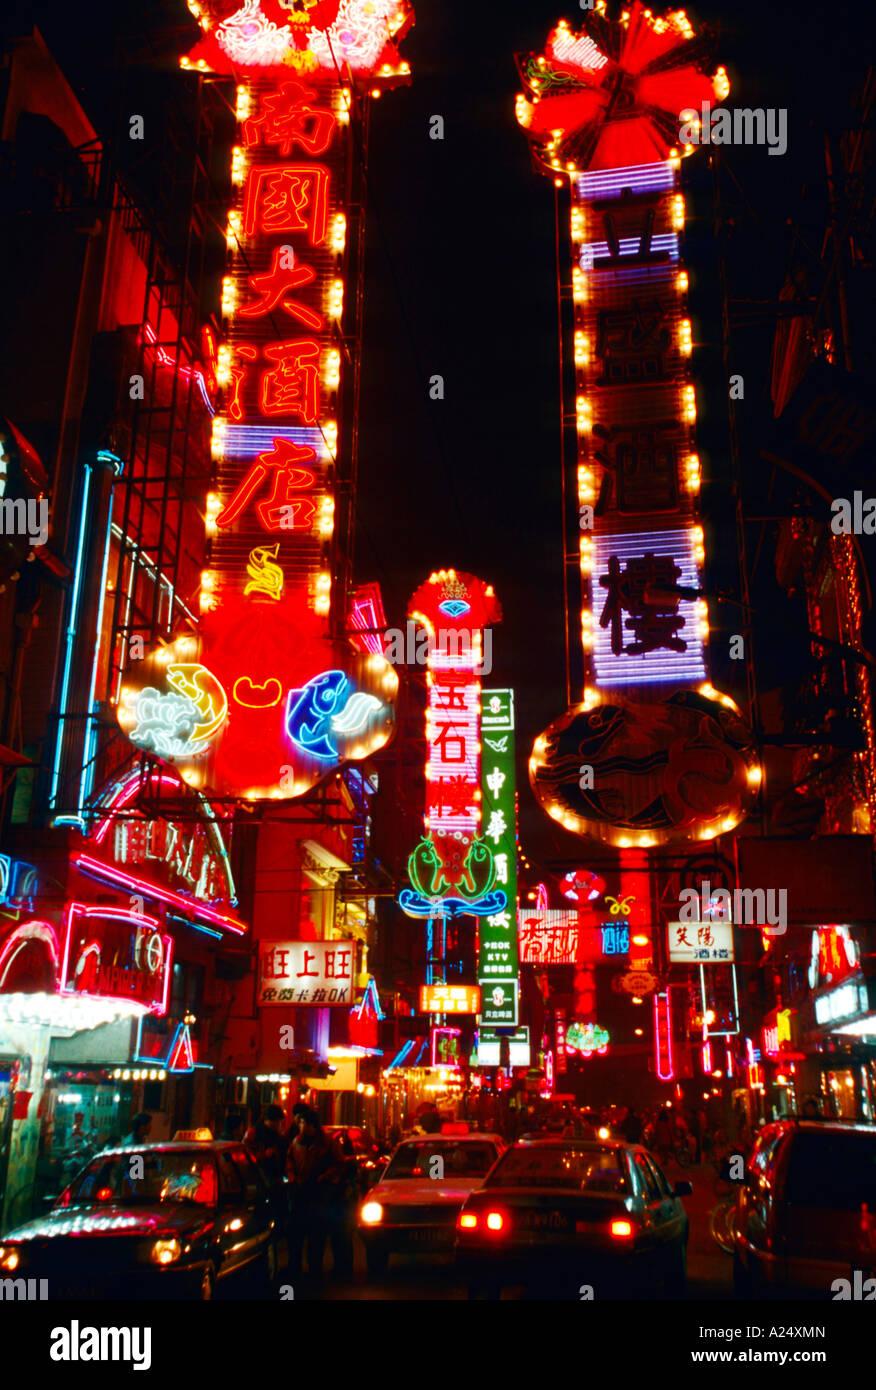 Leuchtreklame Main Shopping Street Zhapu Lu Shanghai China Stock Photo